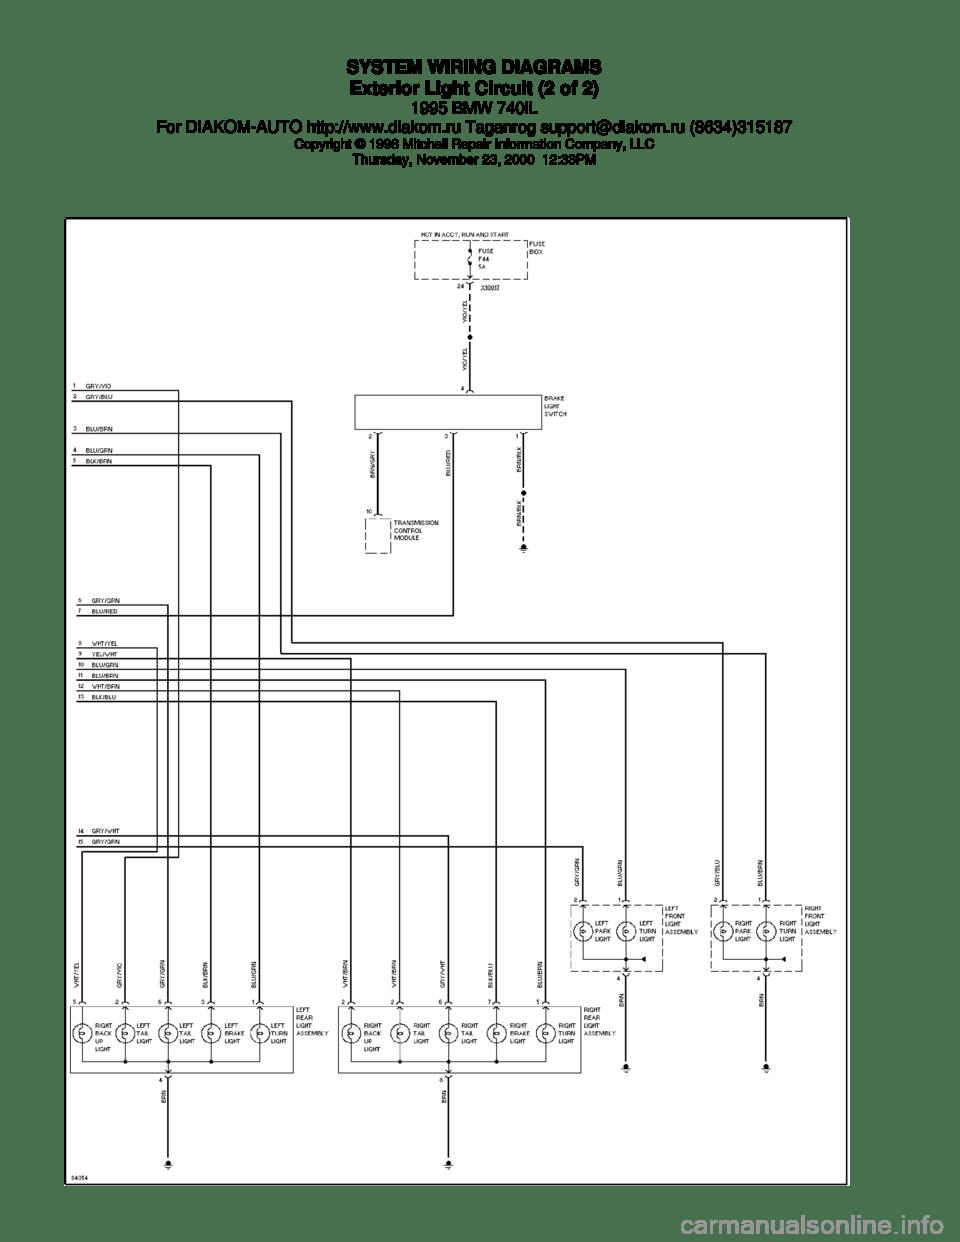 wiring diagram 1998 bmw 740i wiring diagrambmw 740i wiring diagram 1993 bmw 740il wiring diagram schematic1998 bmw 740i wiring diagram simple wiring